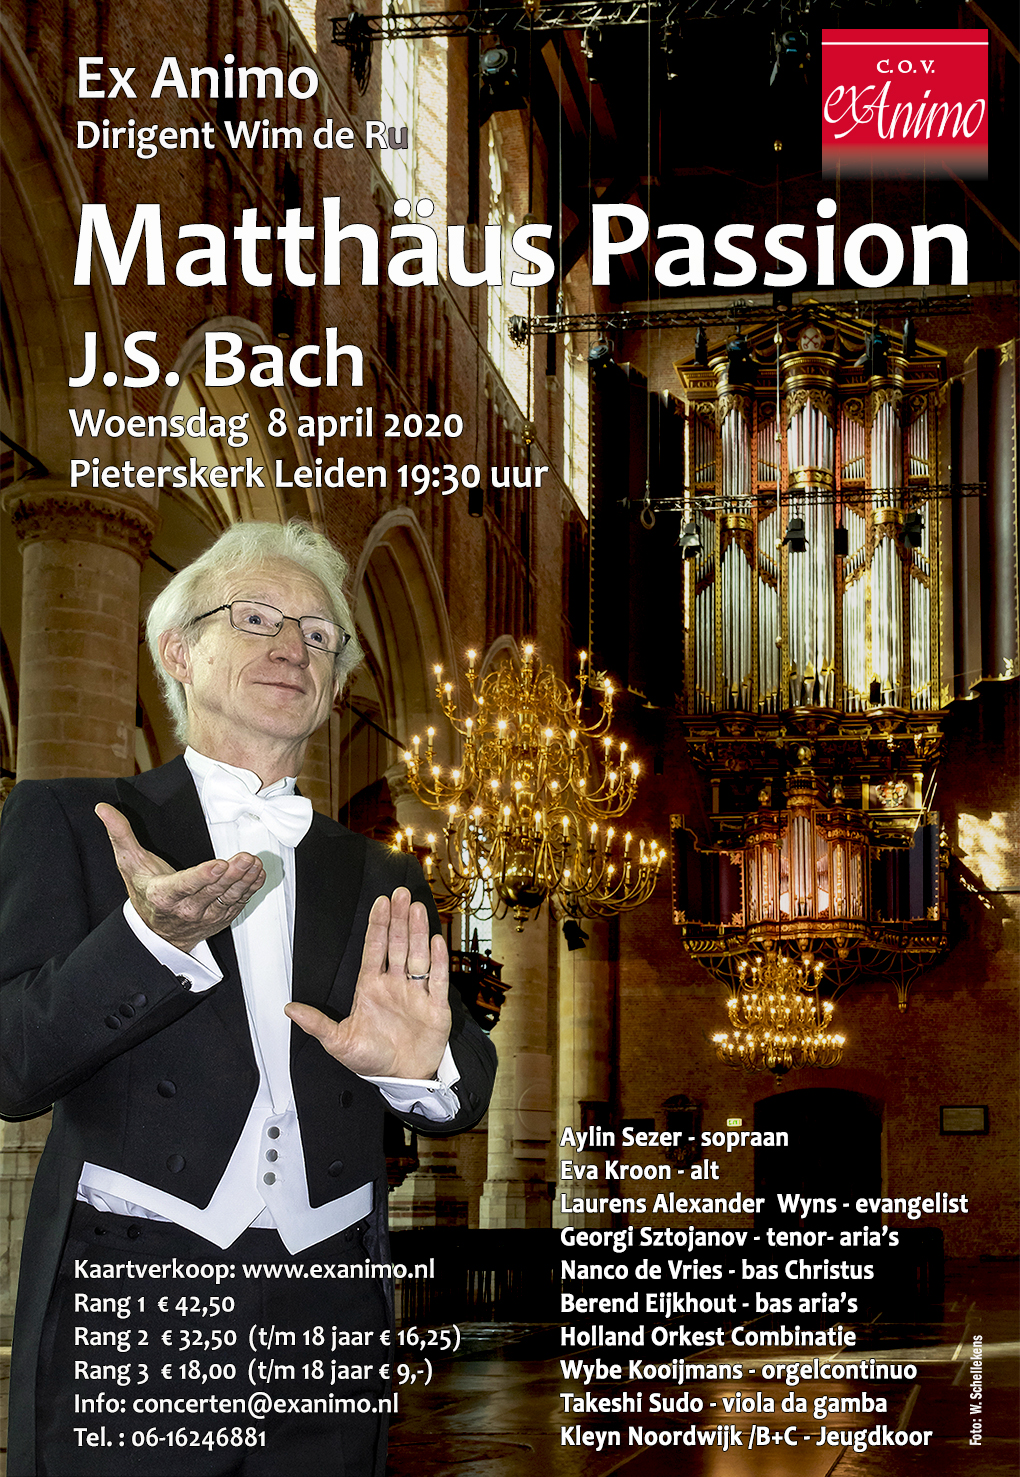 Matthäus Passion  J.S. Bach